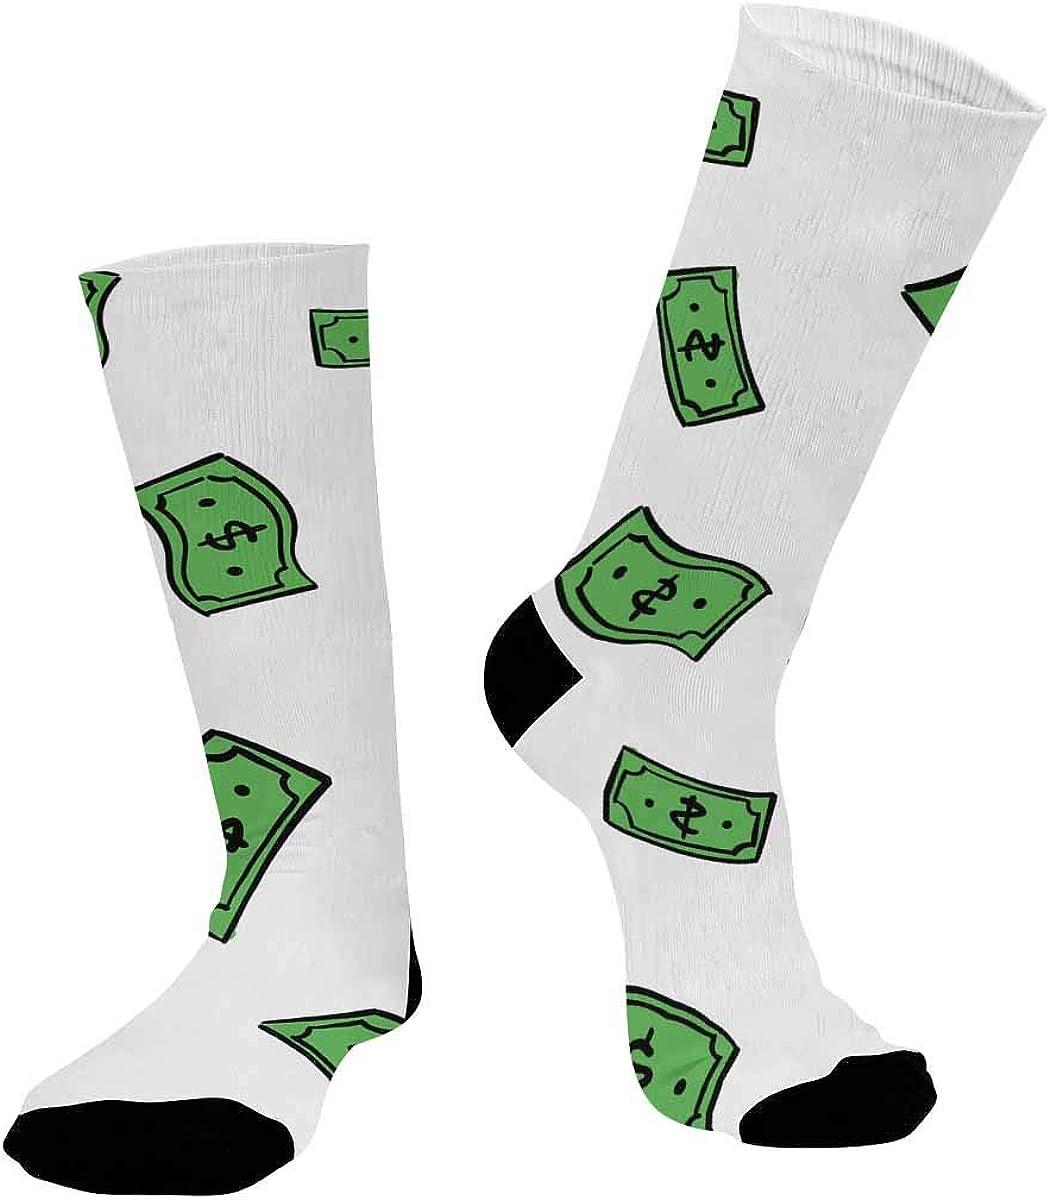 INTERESTPRINT Athletic Sublimated Crew Socks for Adults Money Rain